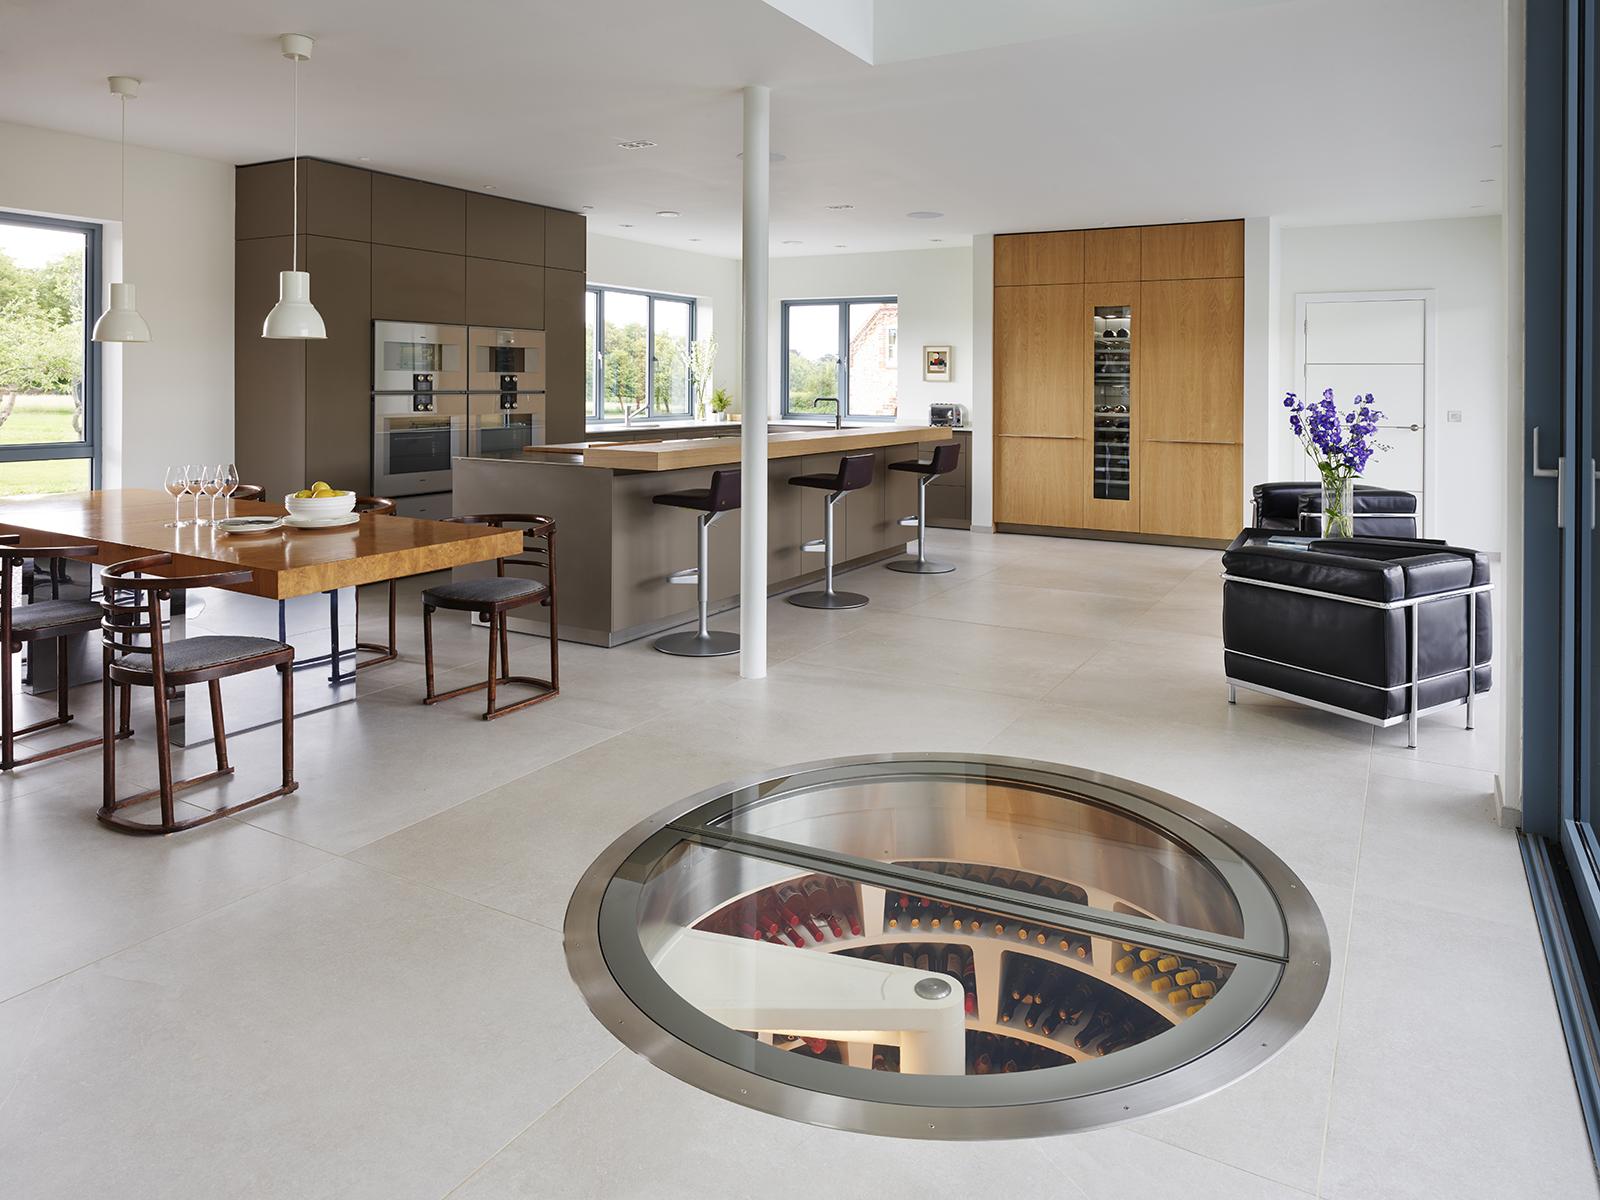 A kitchen with view into a circular spiral underground cellar